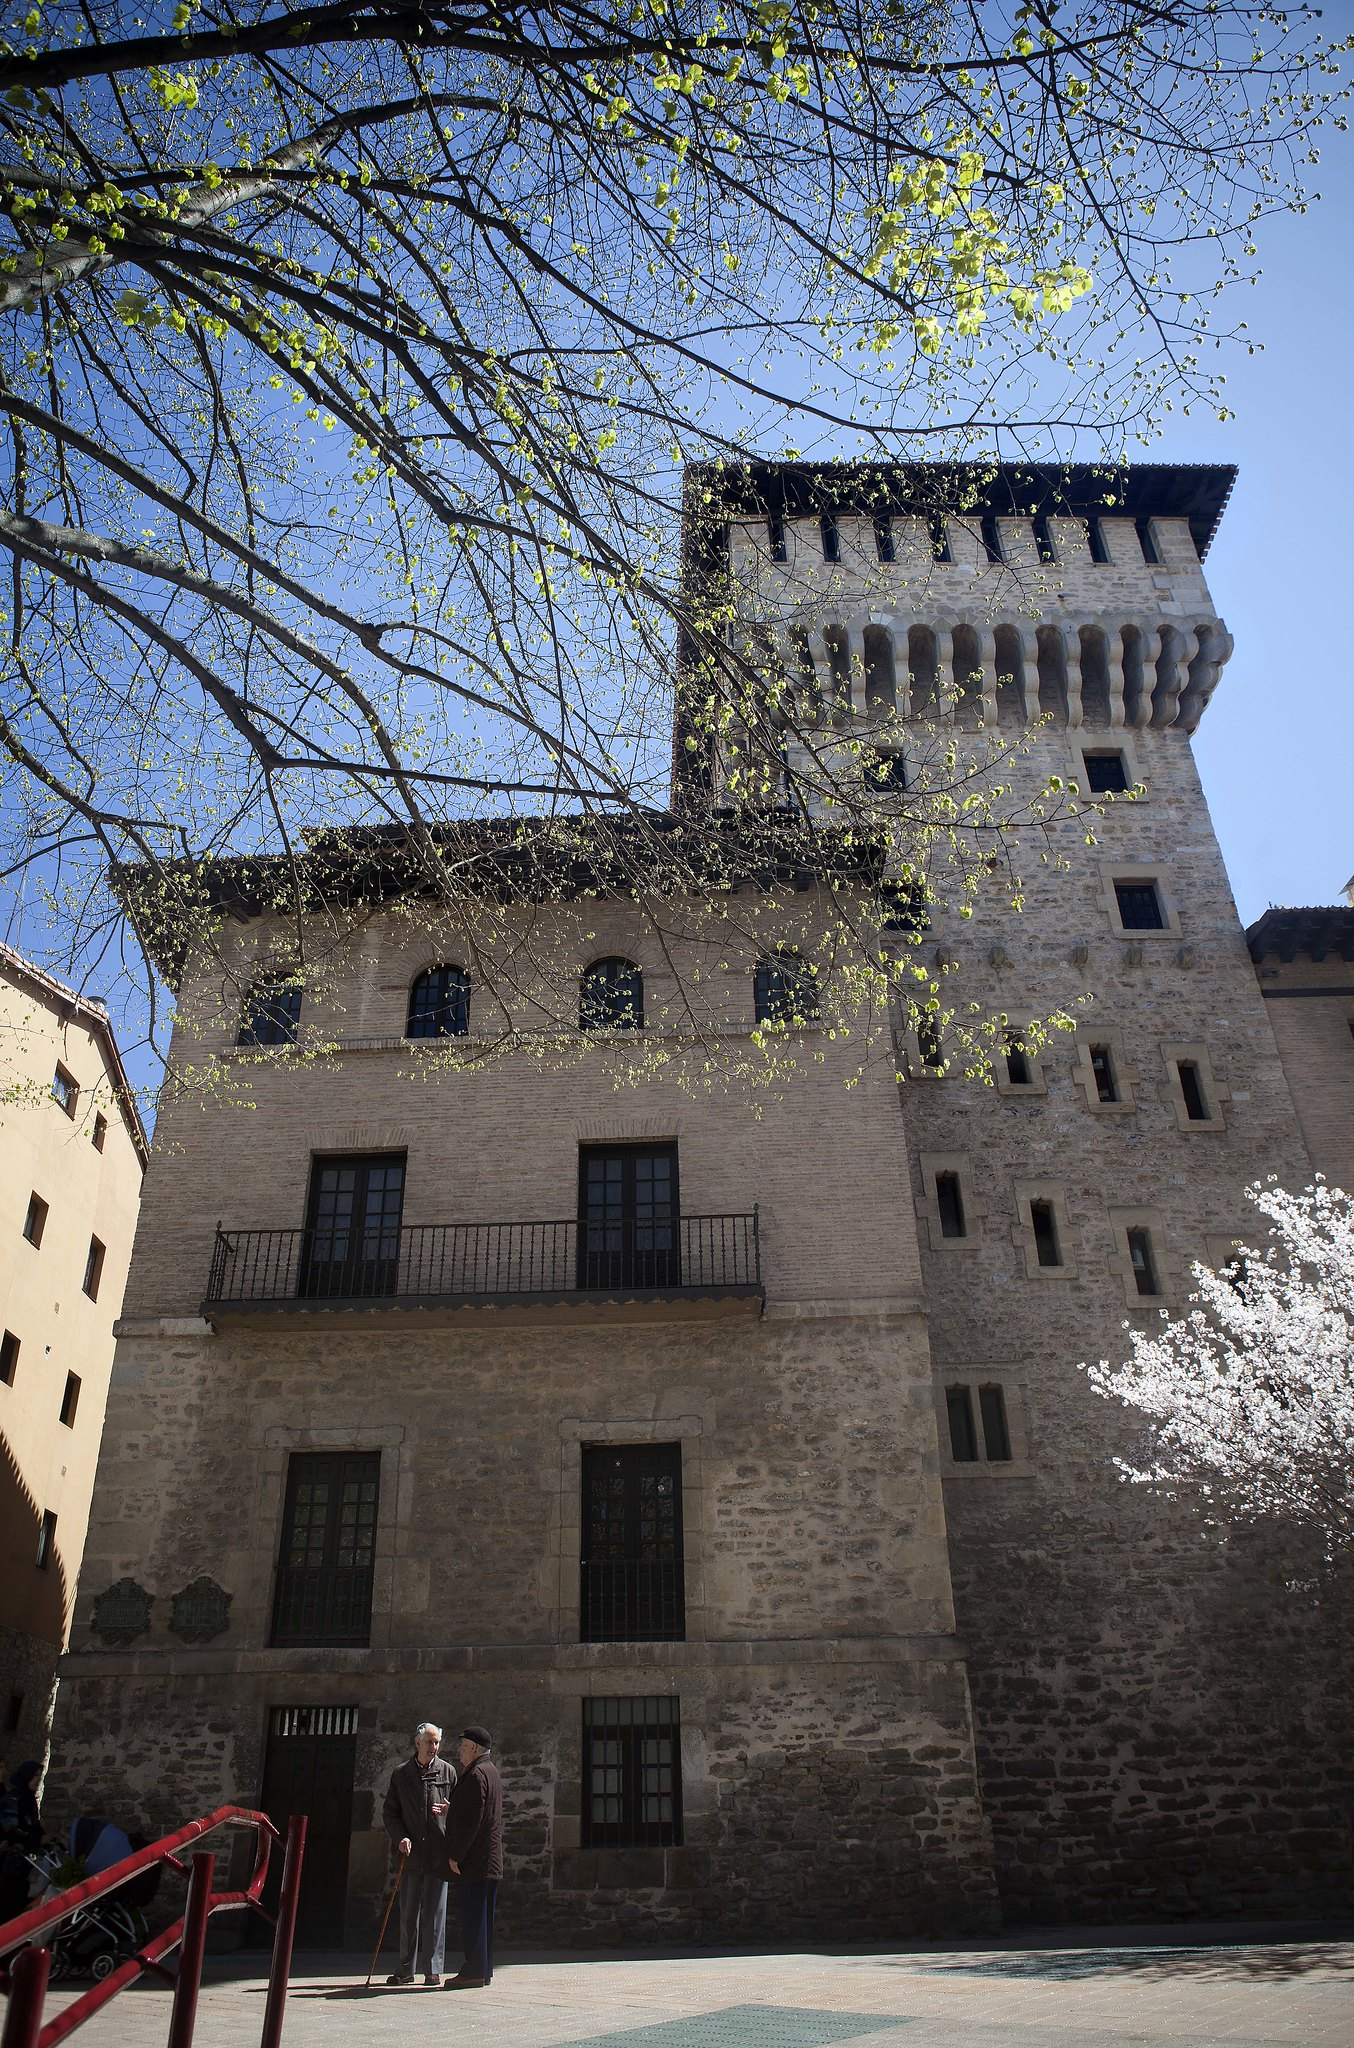 Torre de Doña Ochanda.